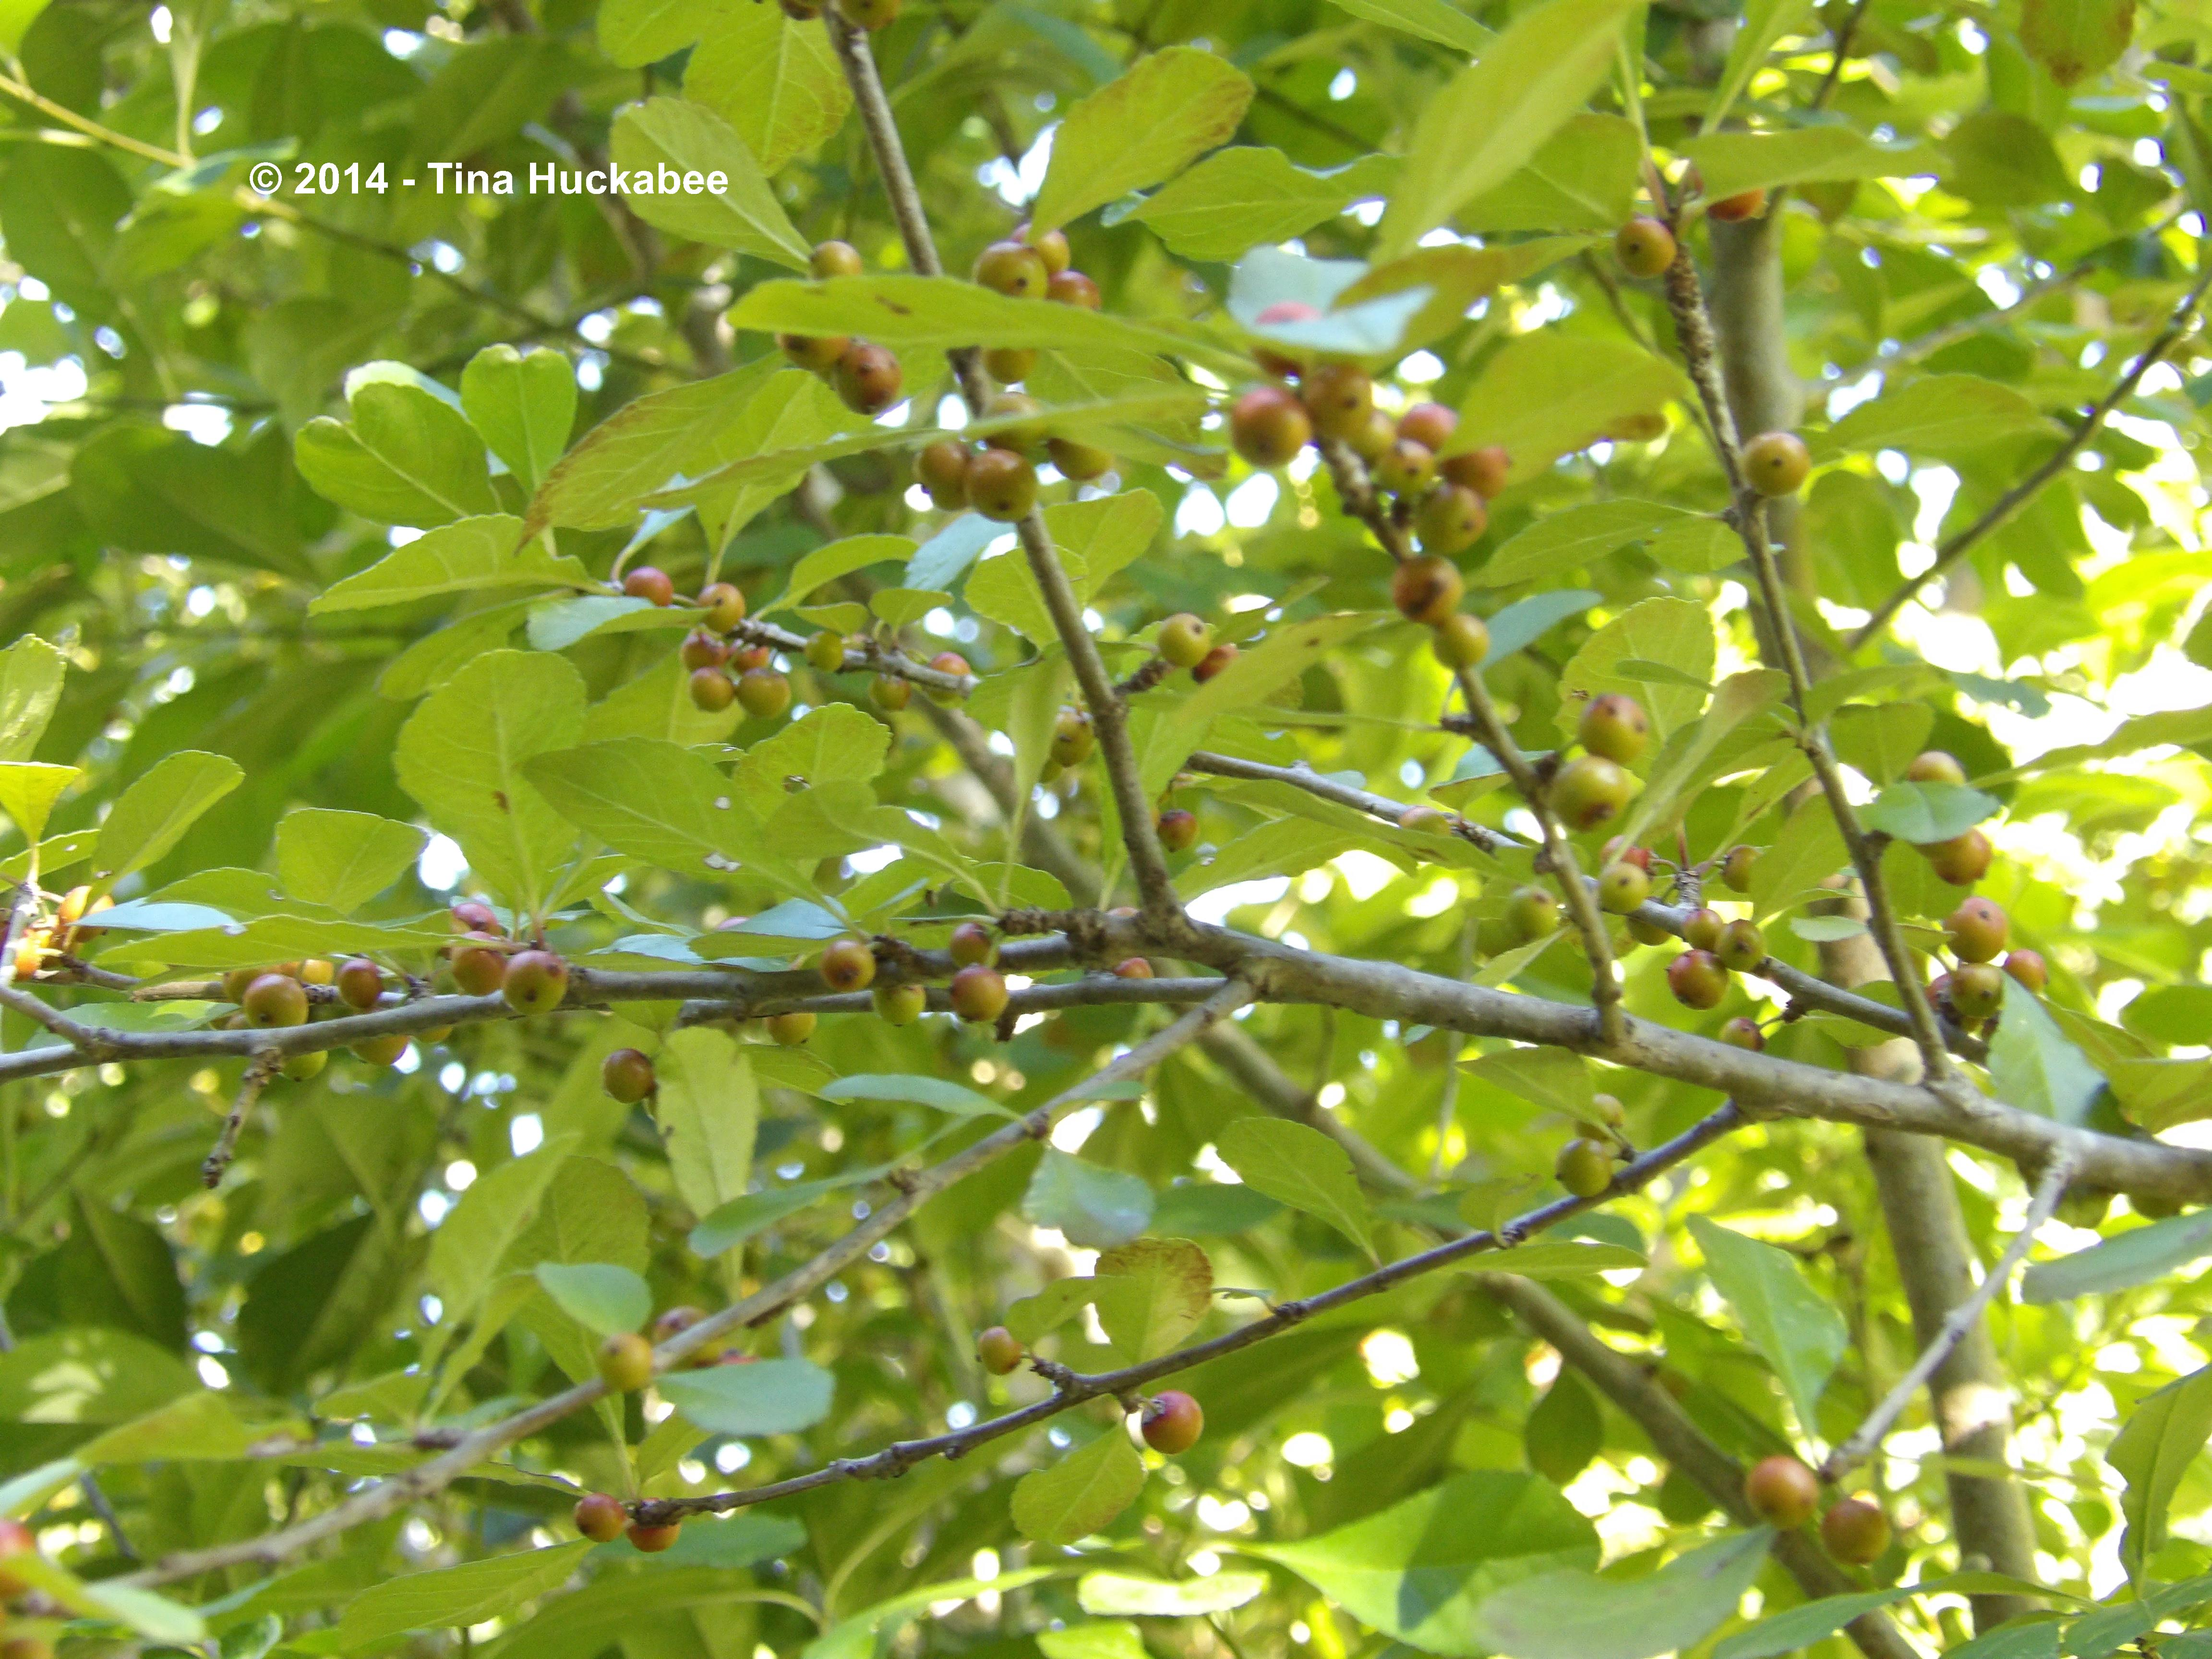 Tree with orange berries in fall juegosagratis com